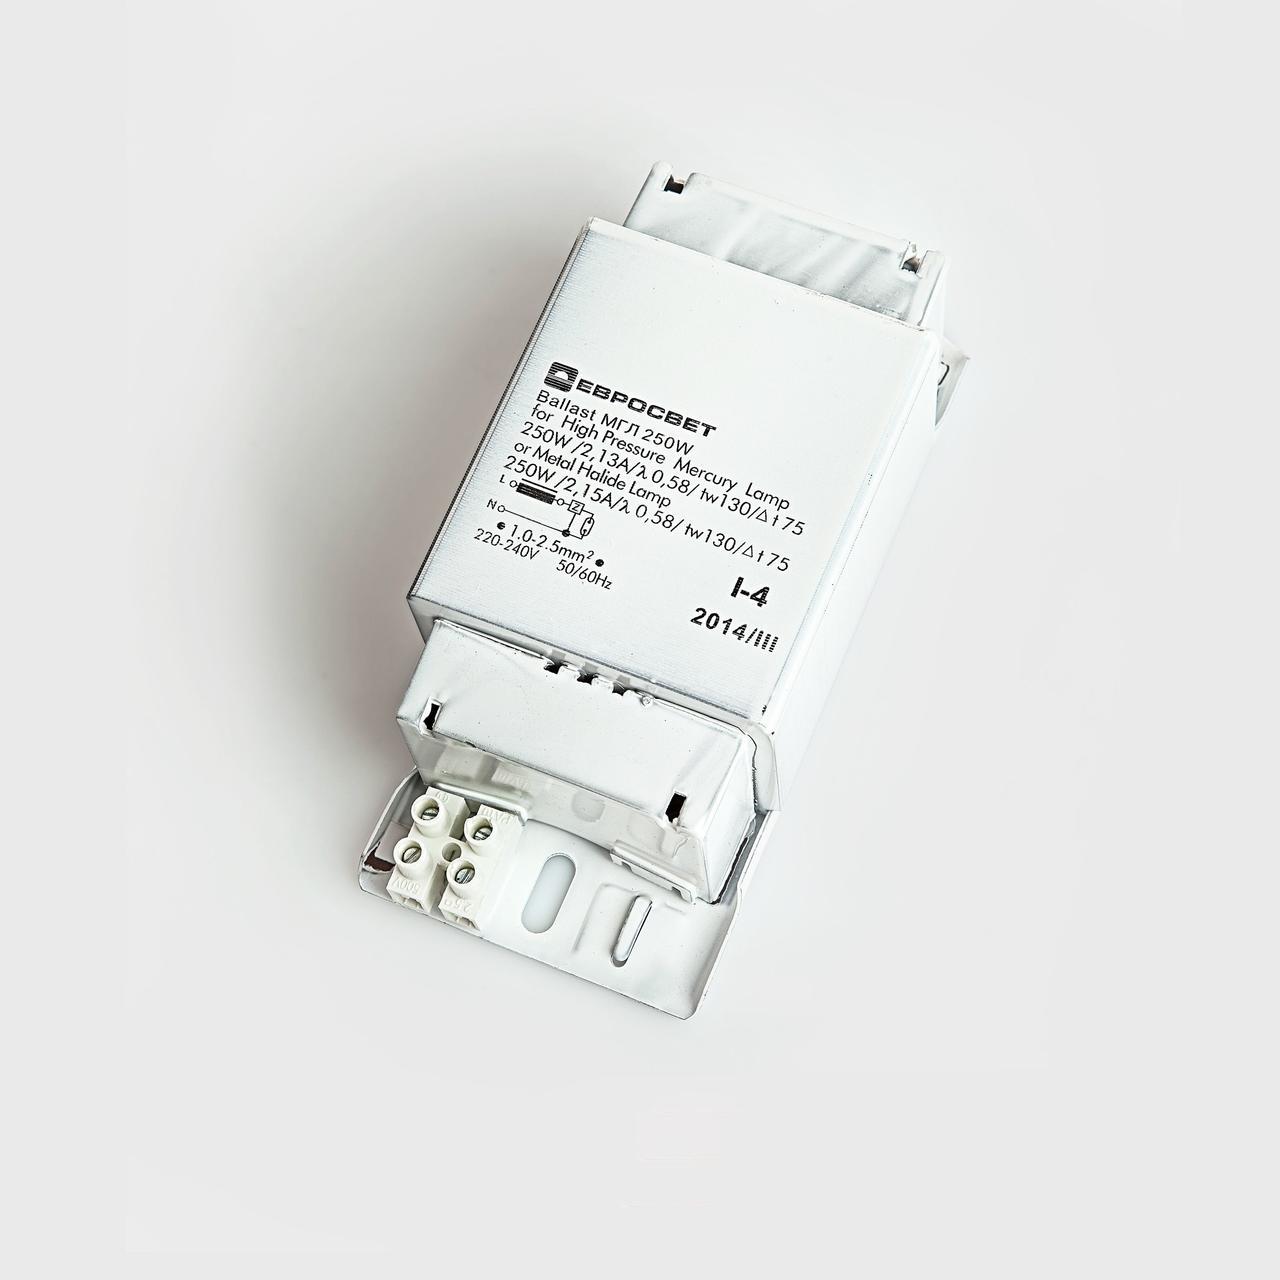 Балласт под металлогалогенную и ртутную лампу МГЛ  ДРЛ 250Вт